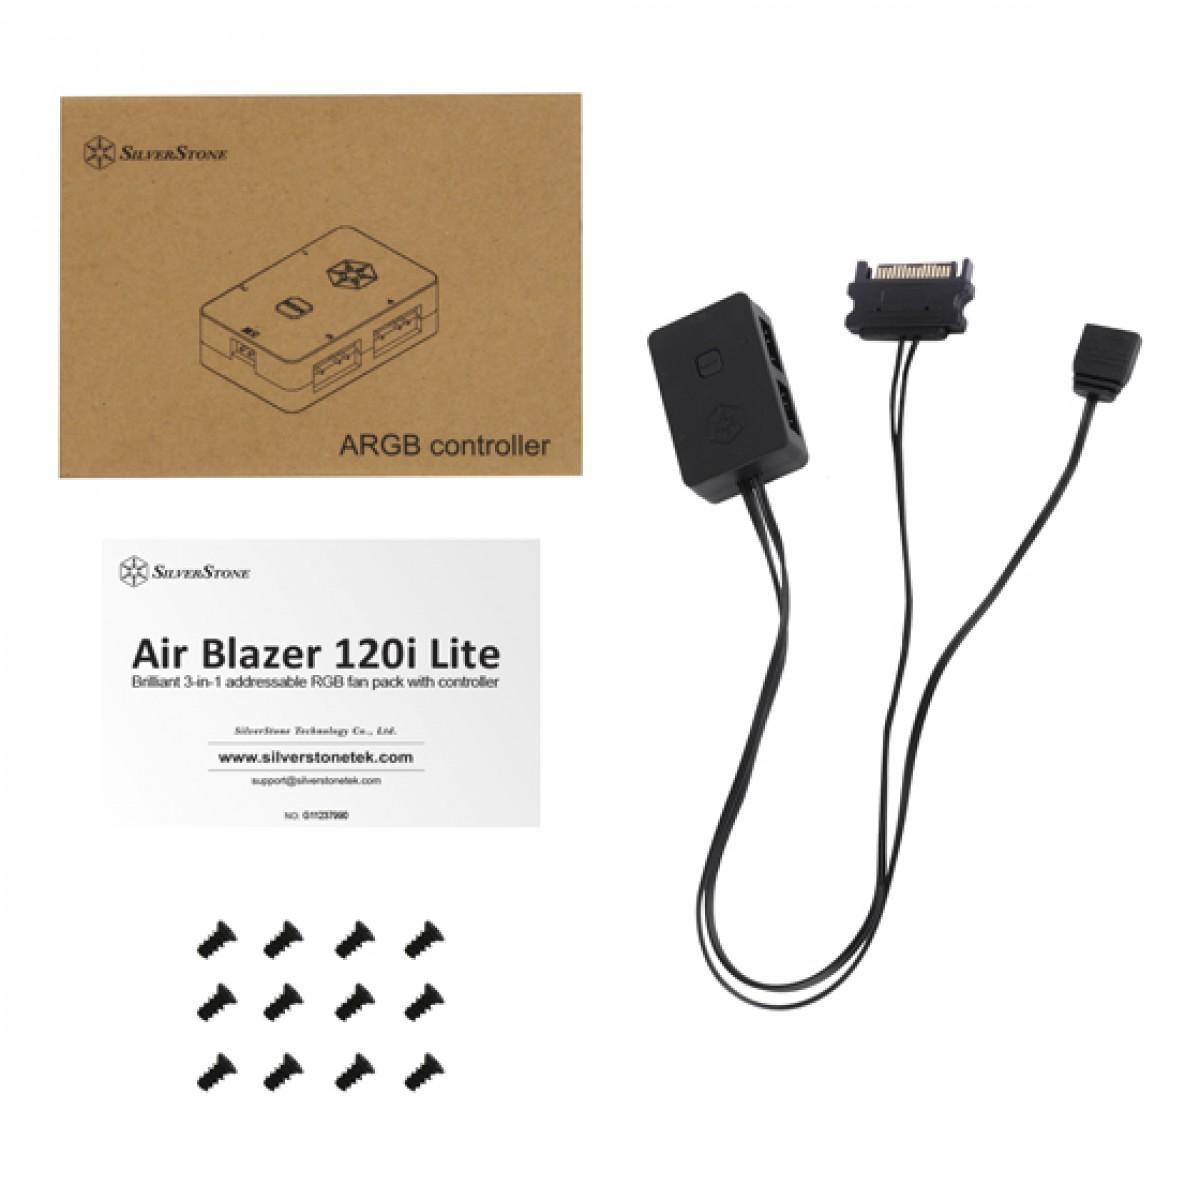 Kit Fan com 3 Unidades SilverStone Air Blazer 120i Lite, ARGB, 120mm, Com Controladora, SST-AB120i-ARGB-3PK